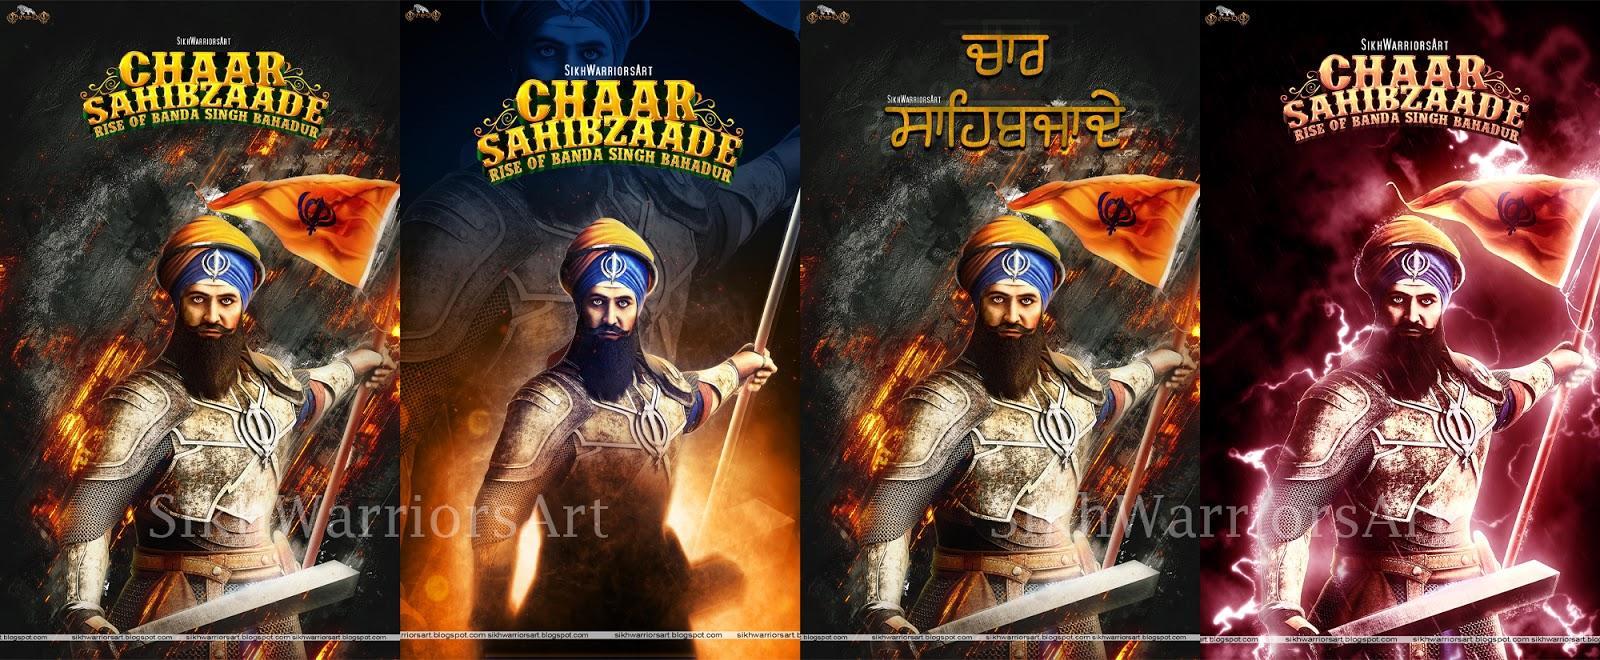 Chaar Sahibzaade Rise Of Banda Singh Bahadur